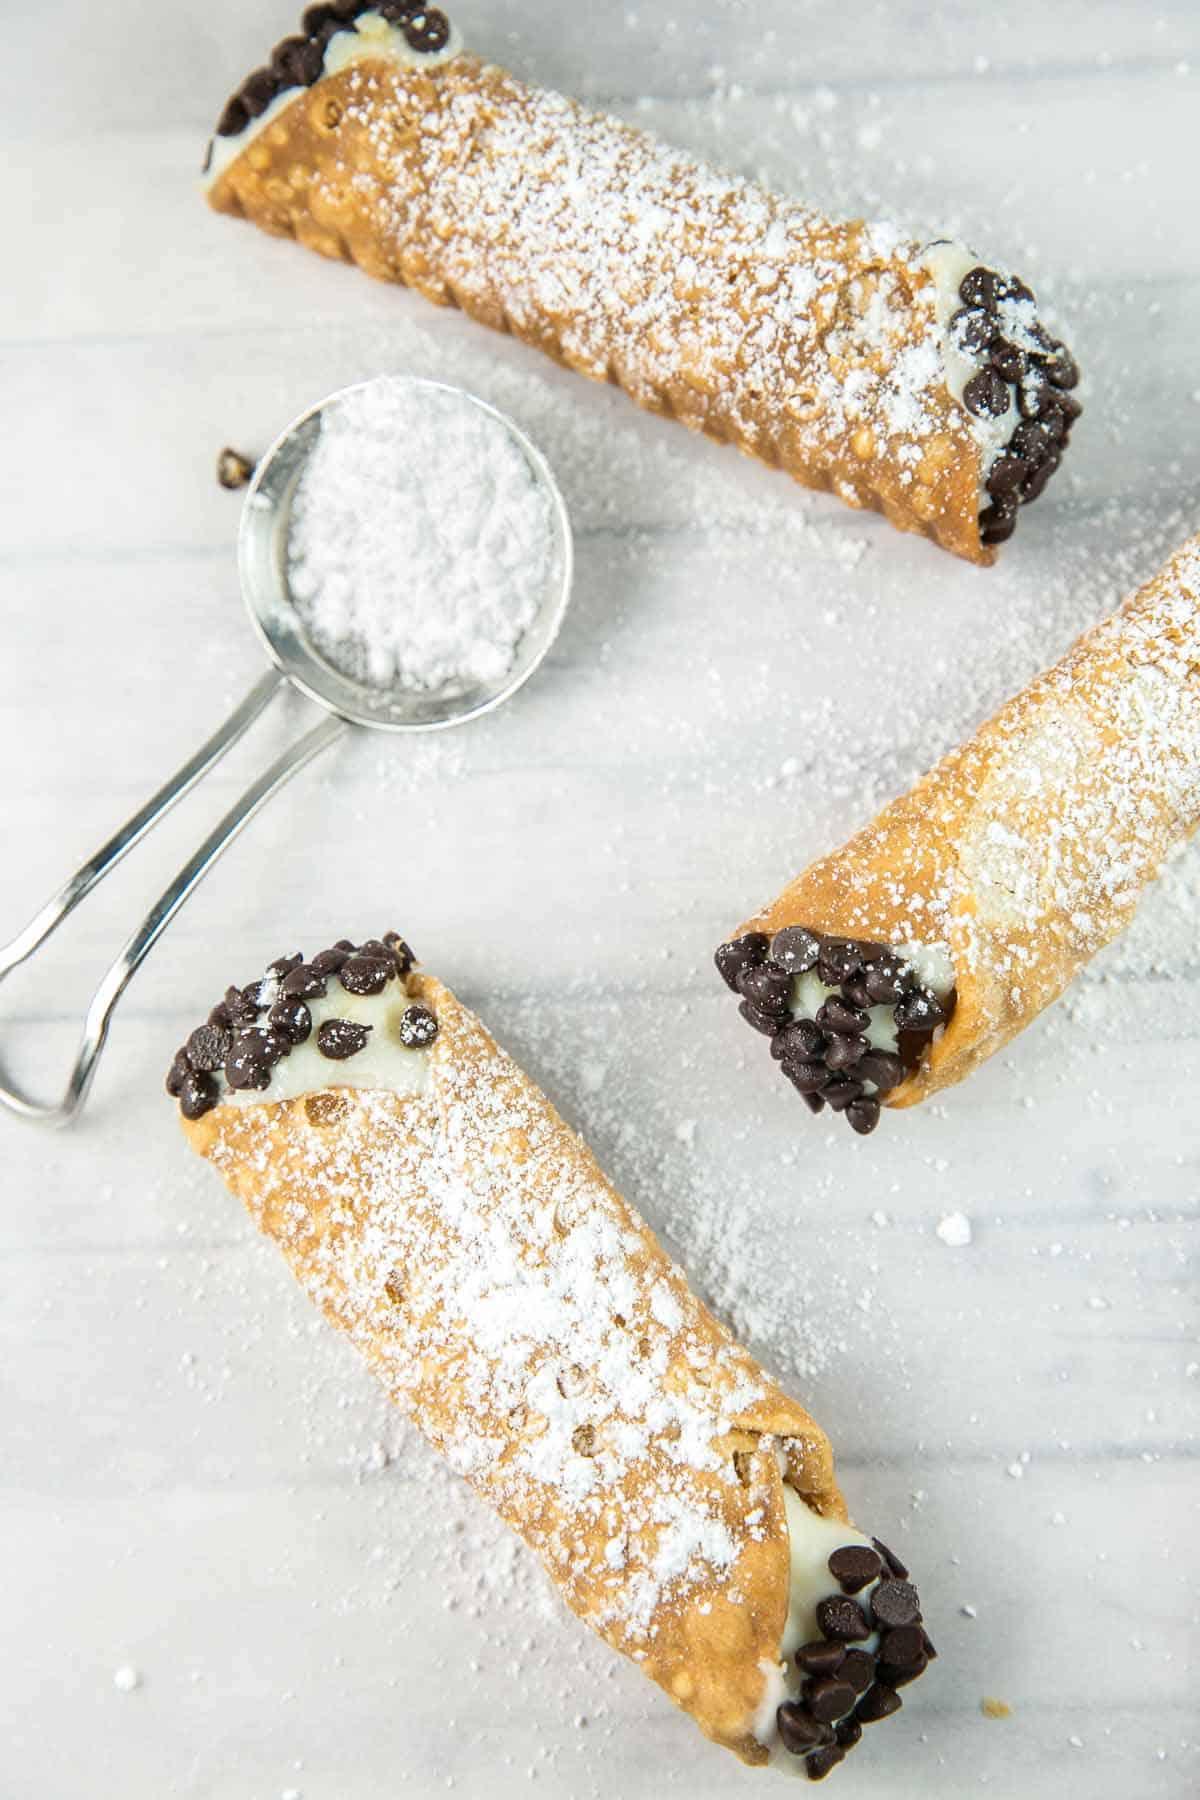 Homemade Cannoli Recipe: traditional cannoli with deep fried shells an a smooth ricotta filling. As good as Italian bakery! {bunsenburnerbakery.com} #cannoli #italian #italiandesserts